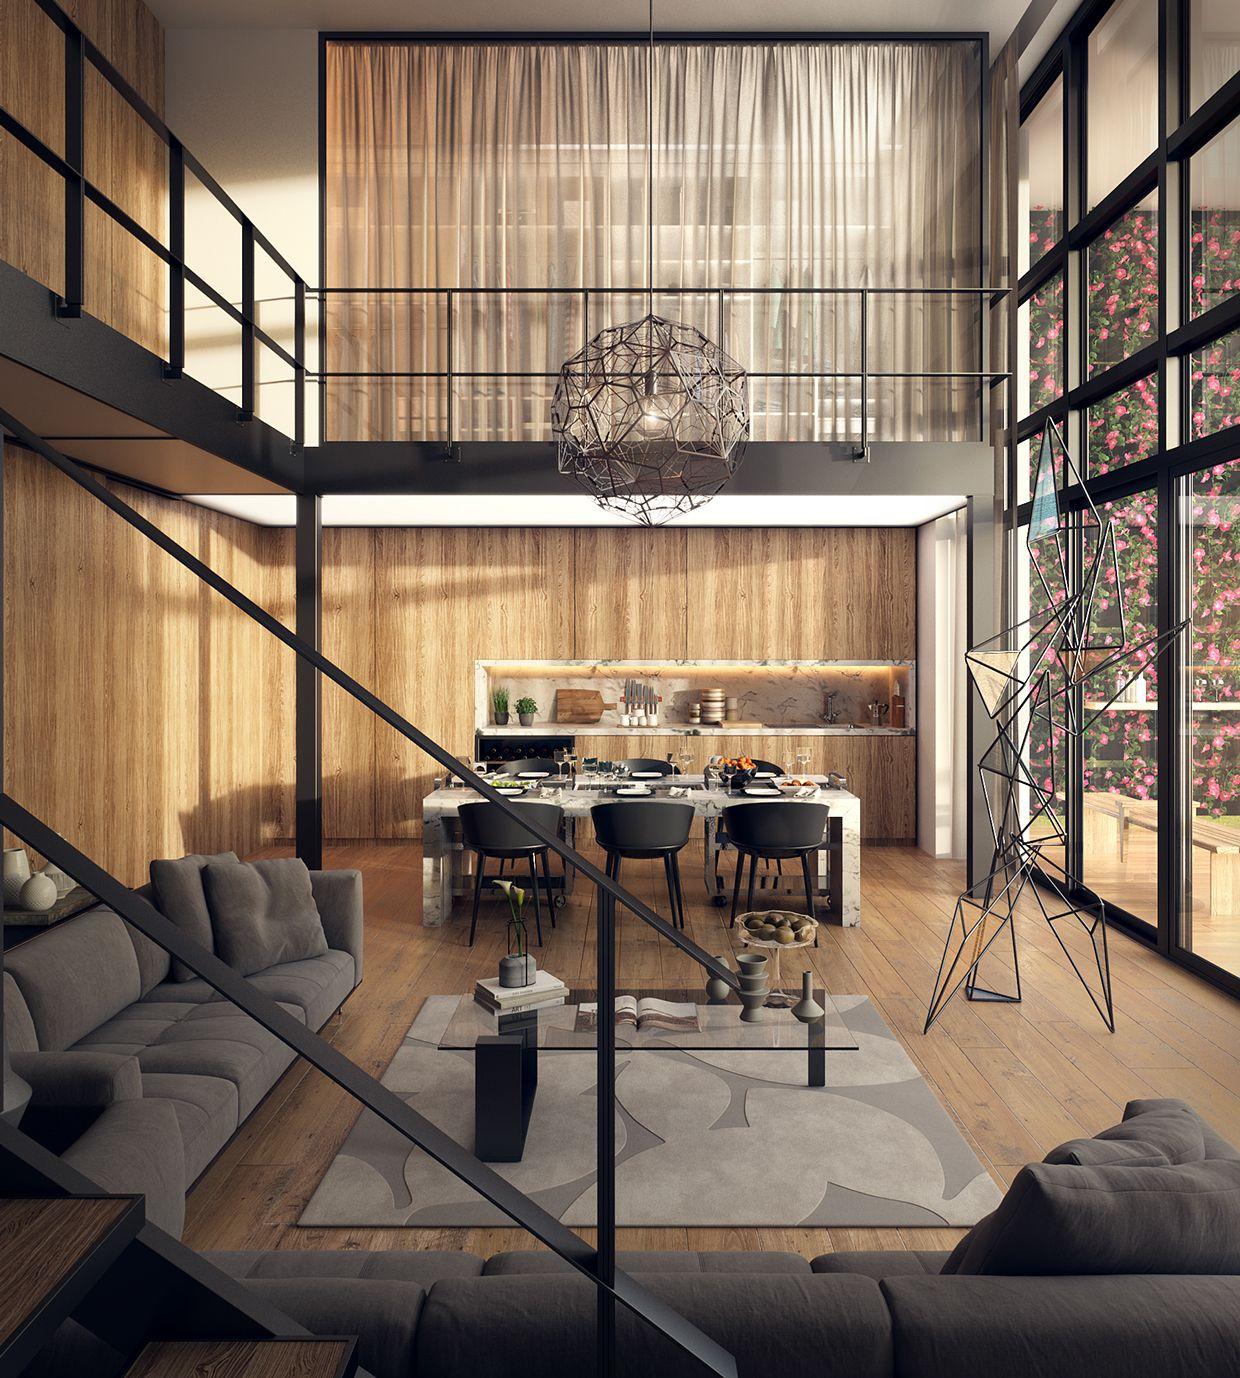 Le Loft Interior Pinterest Lofts Architects and Interiors